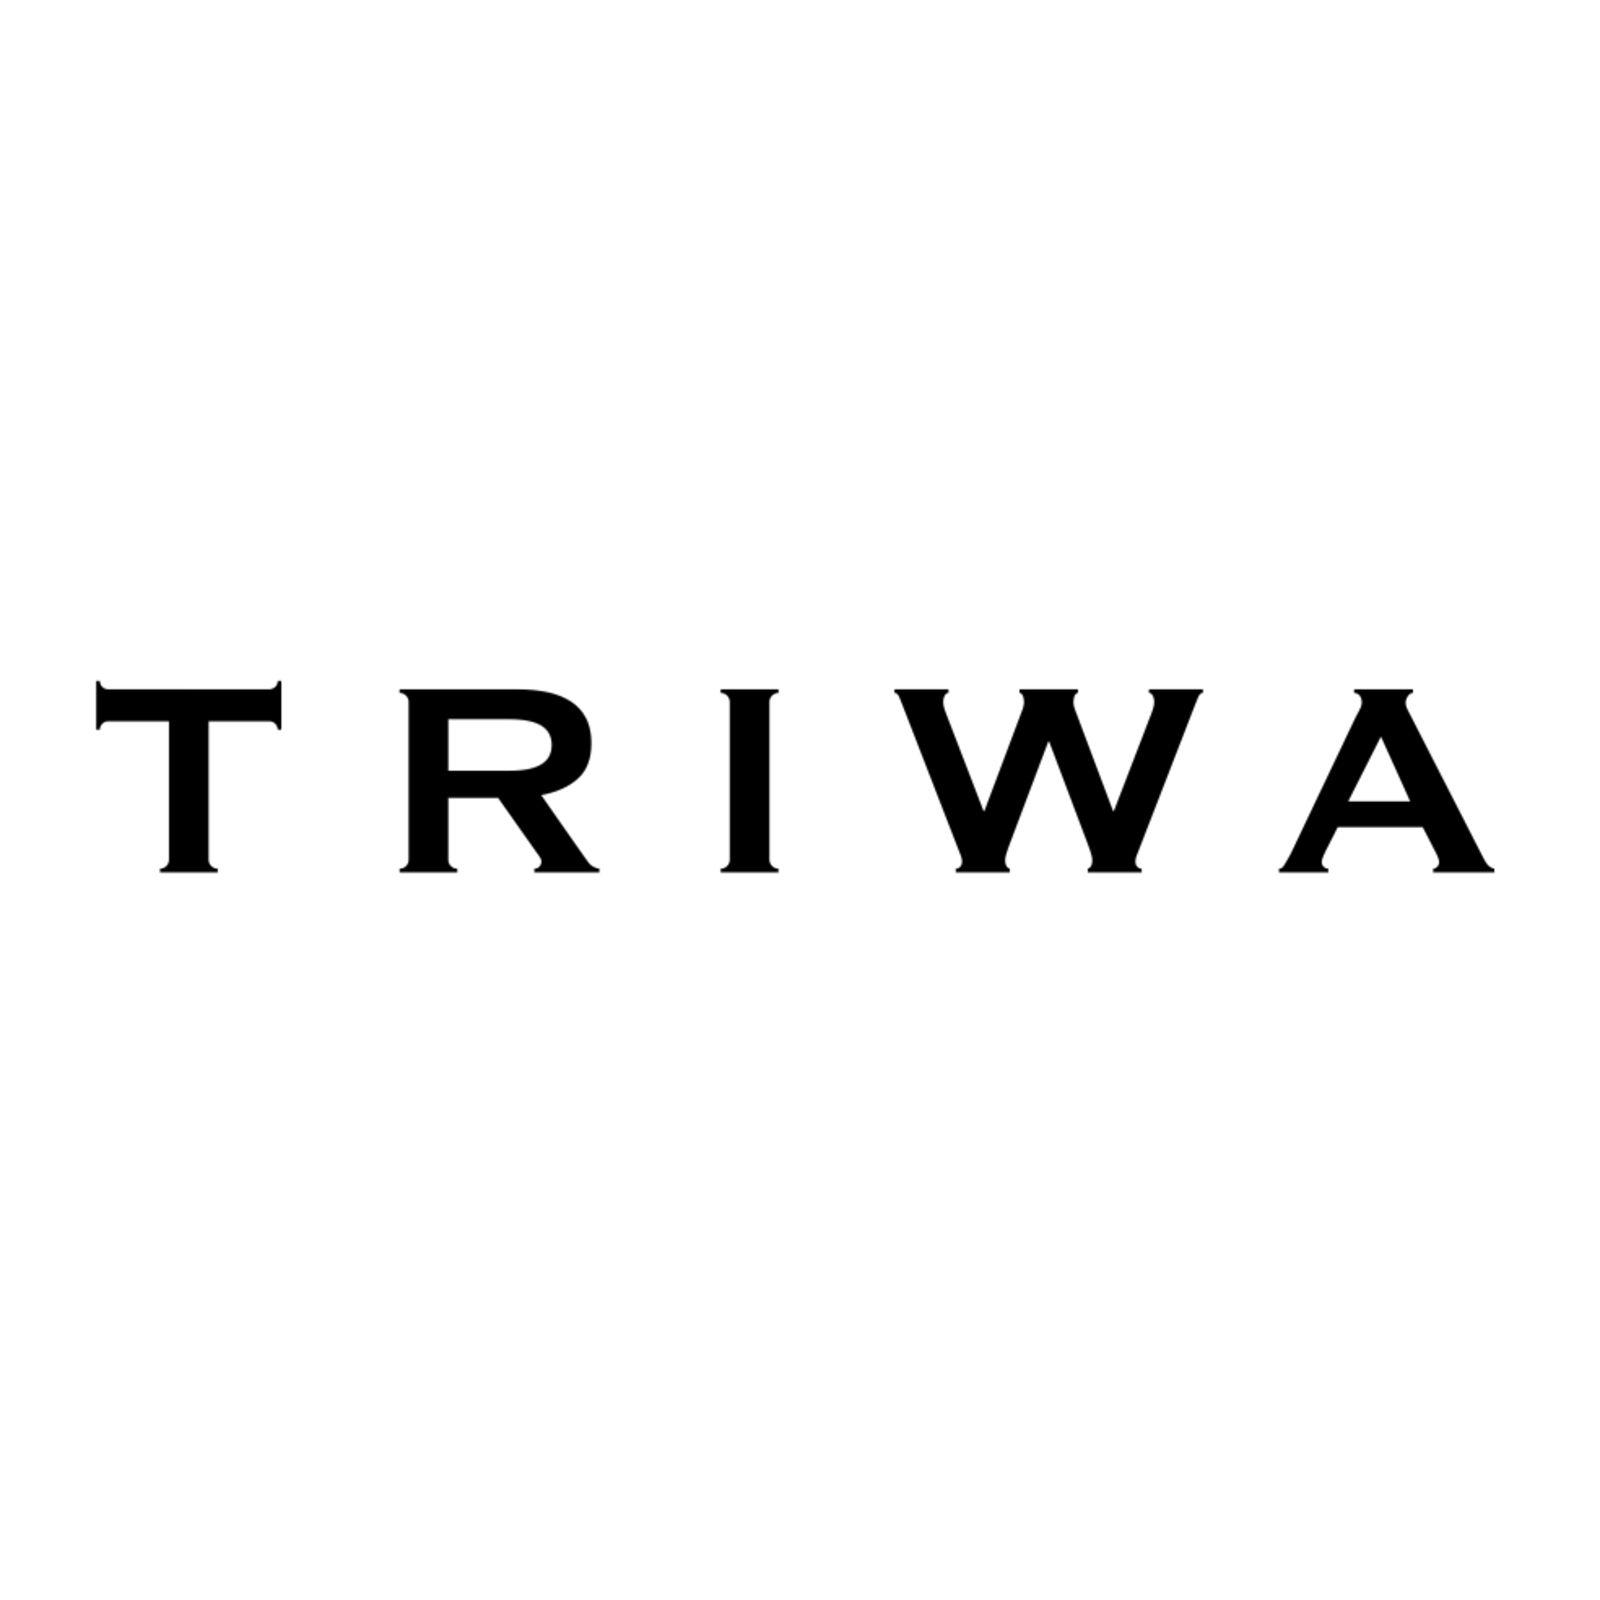 TRIWA (Image 1)